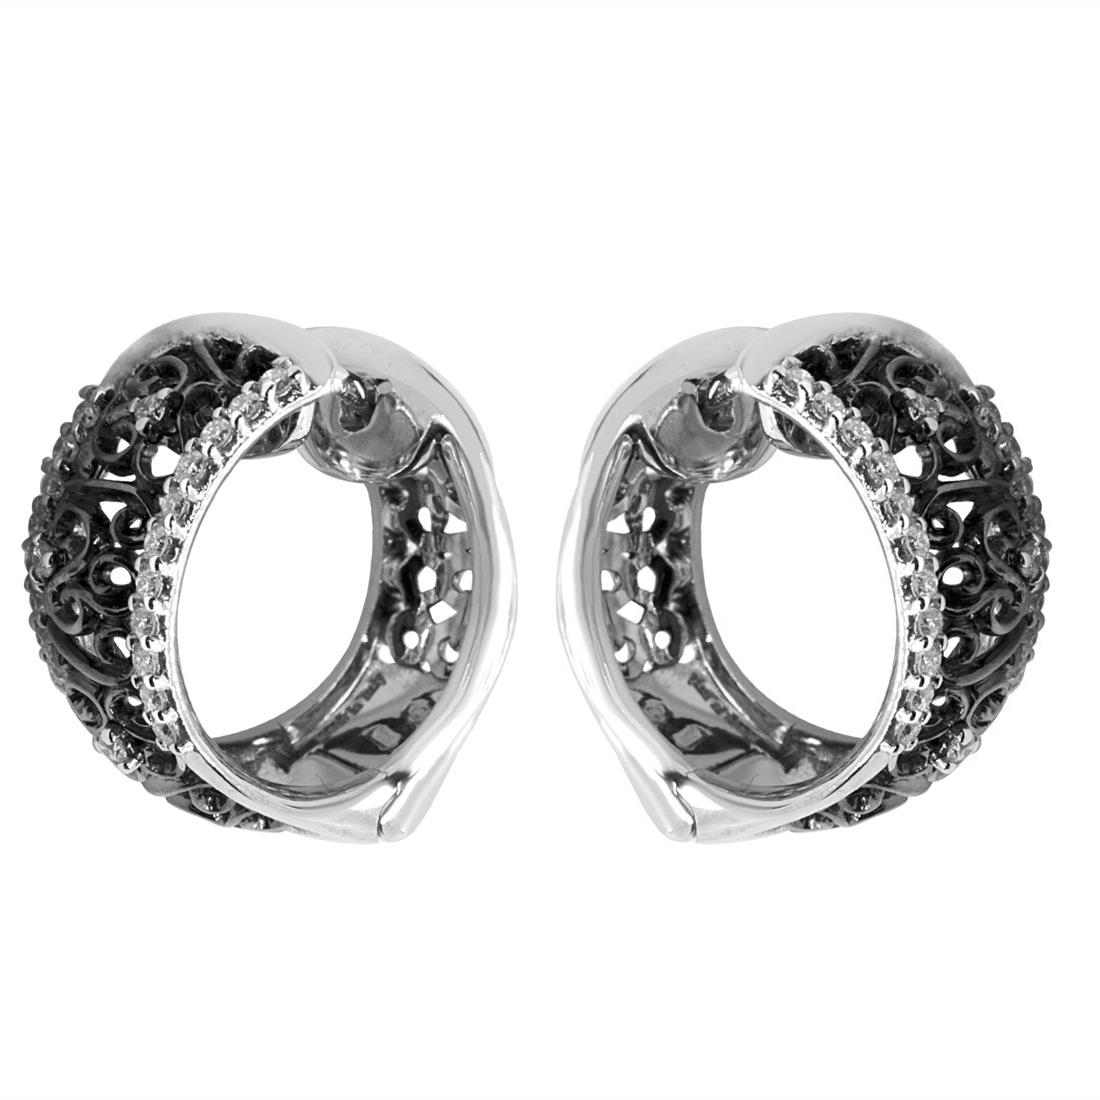 Orecchini Alfieri & St John con diamanti ct 0,43 - ALFIERI ST JOHN